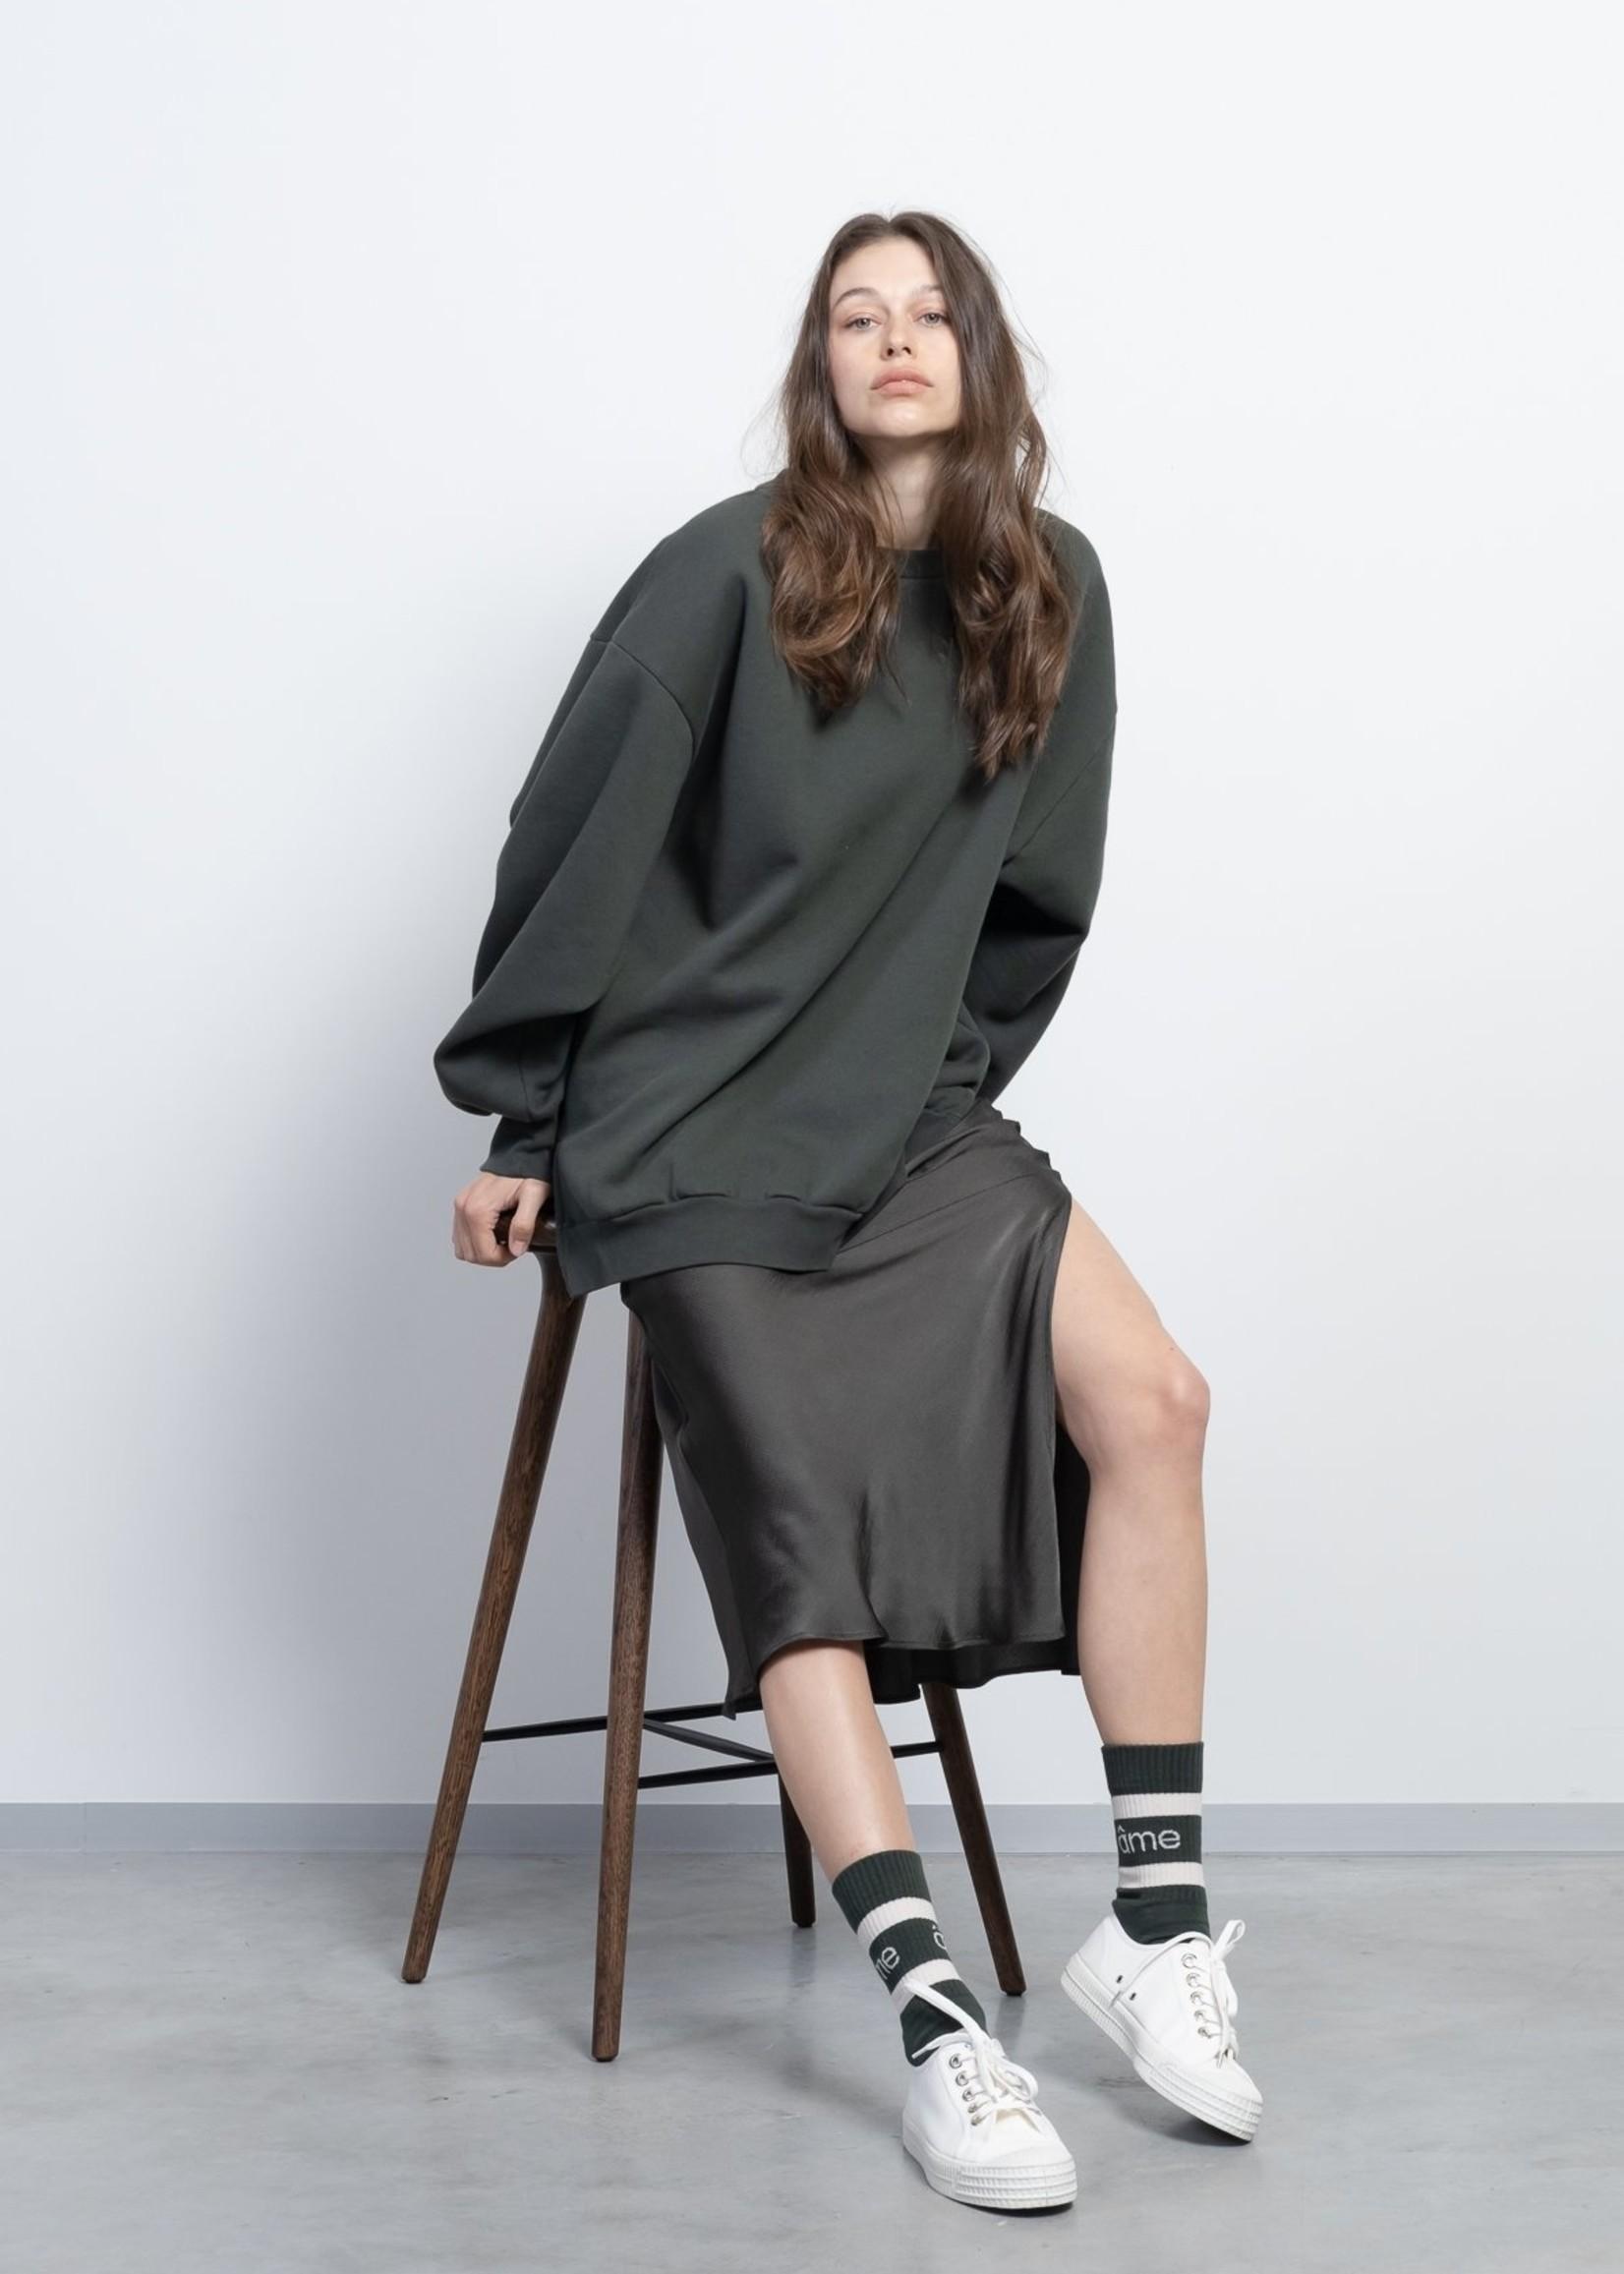 Ame ame antwerp skirt with split bristol green